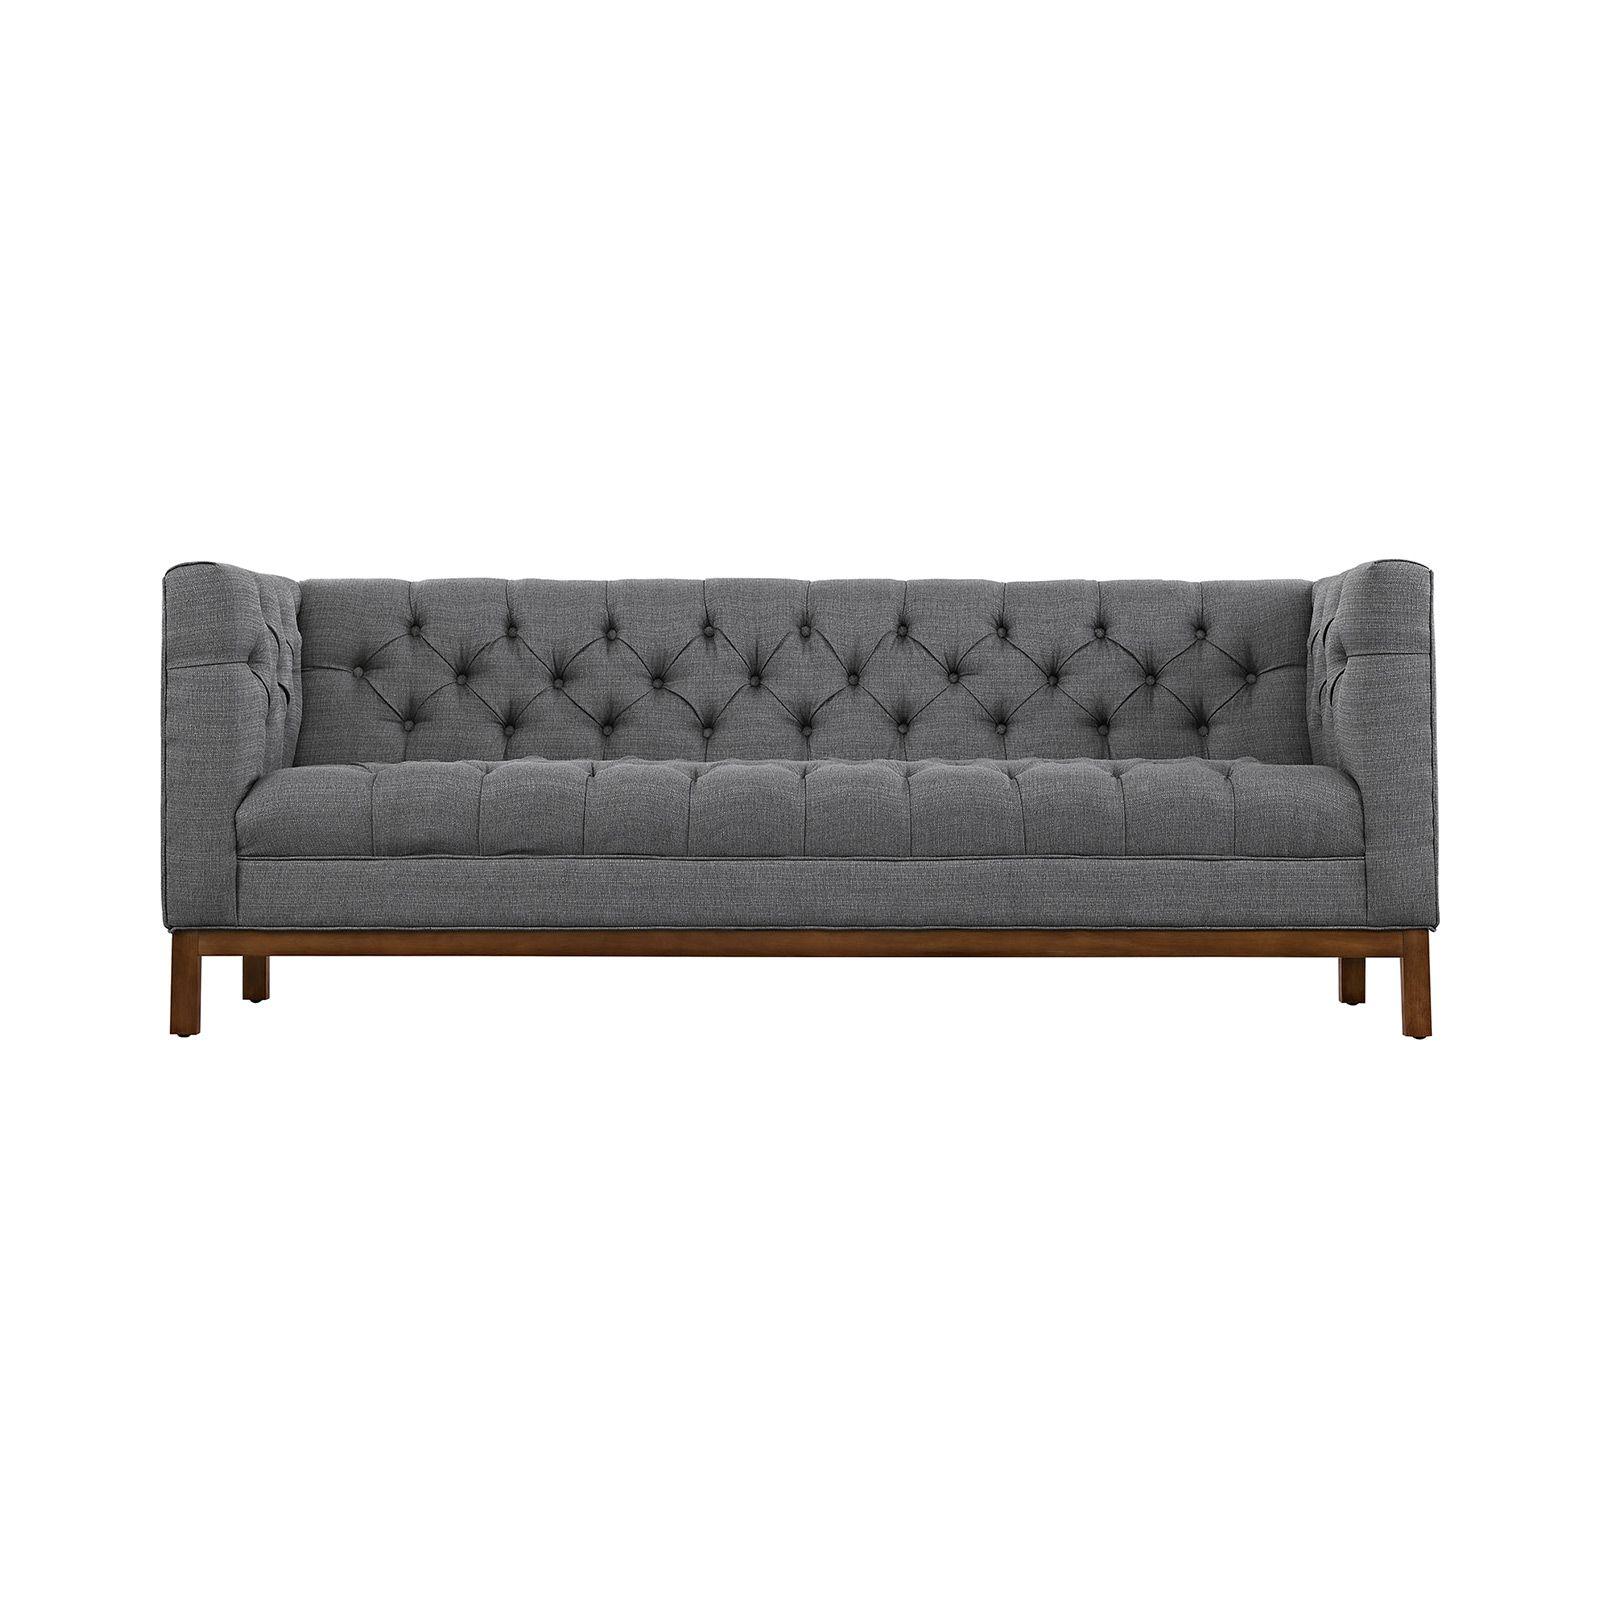 Jarvis Fabric Sofa. $889